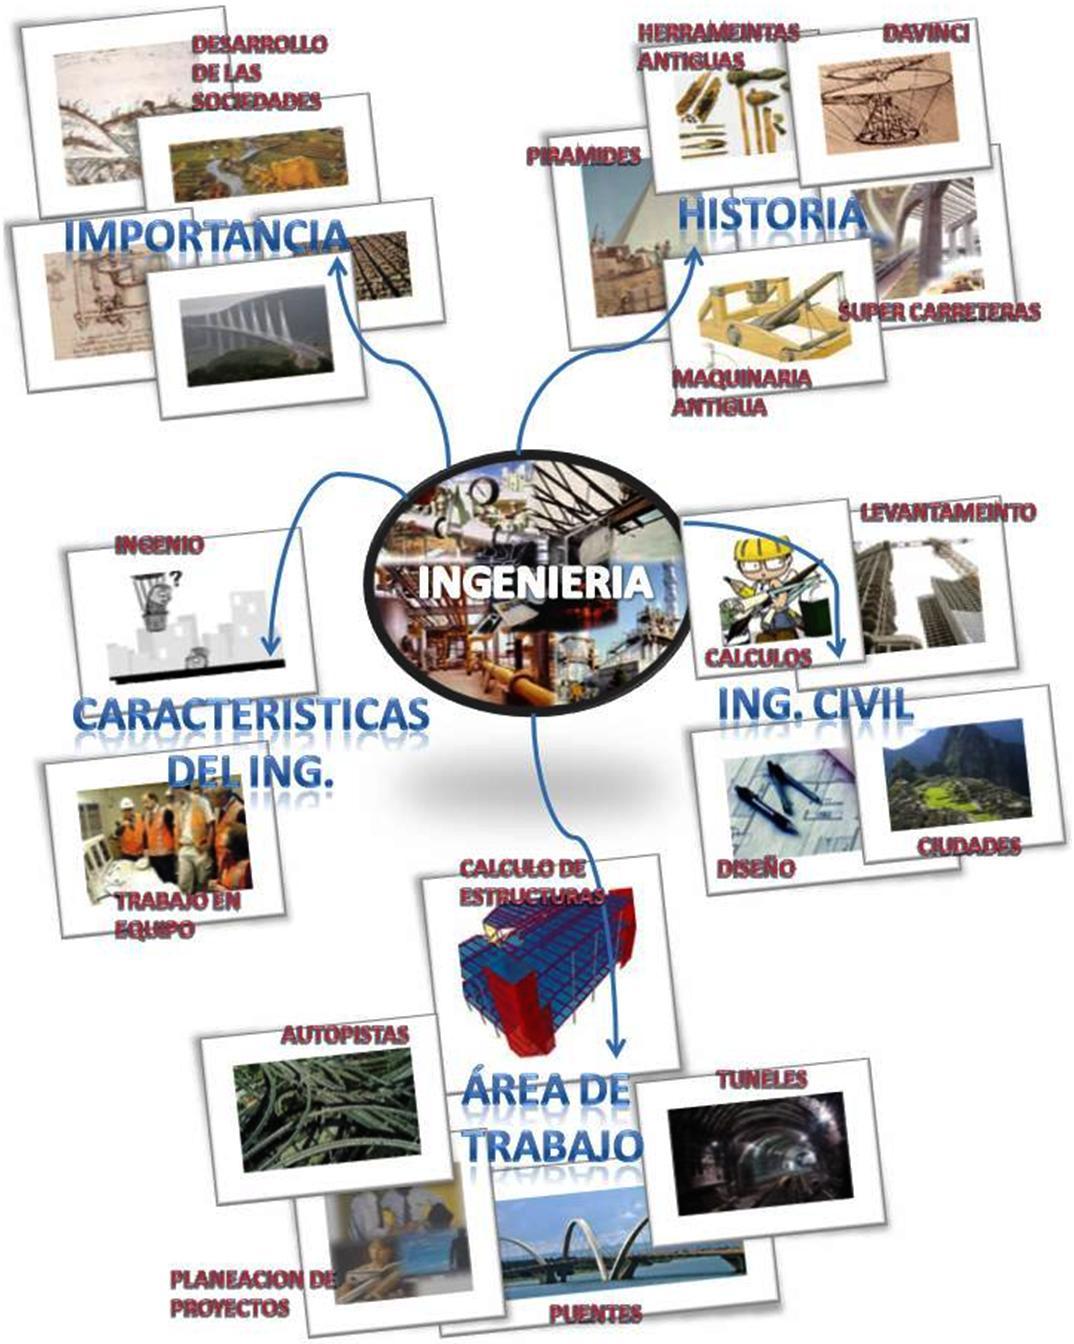 estudio ingenieria venezuela: